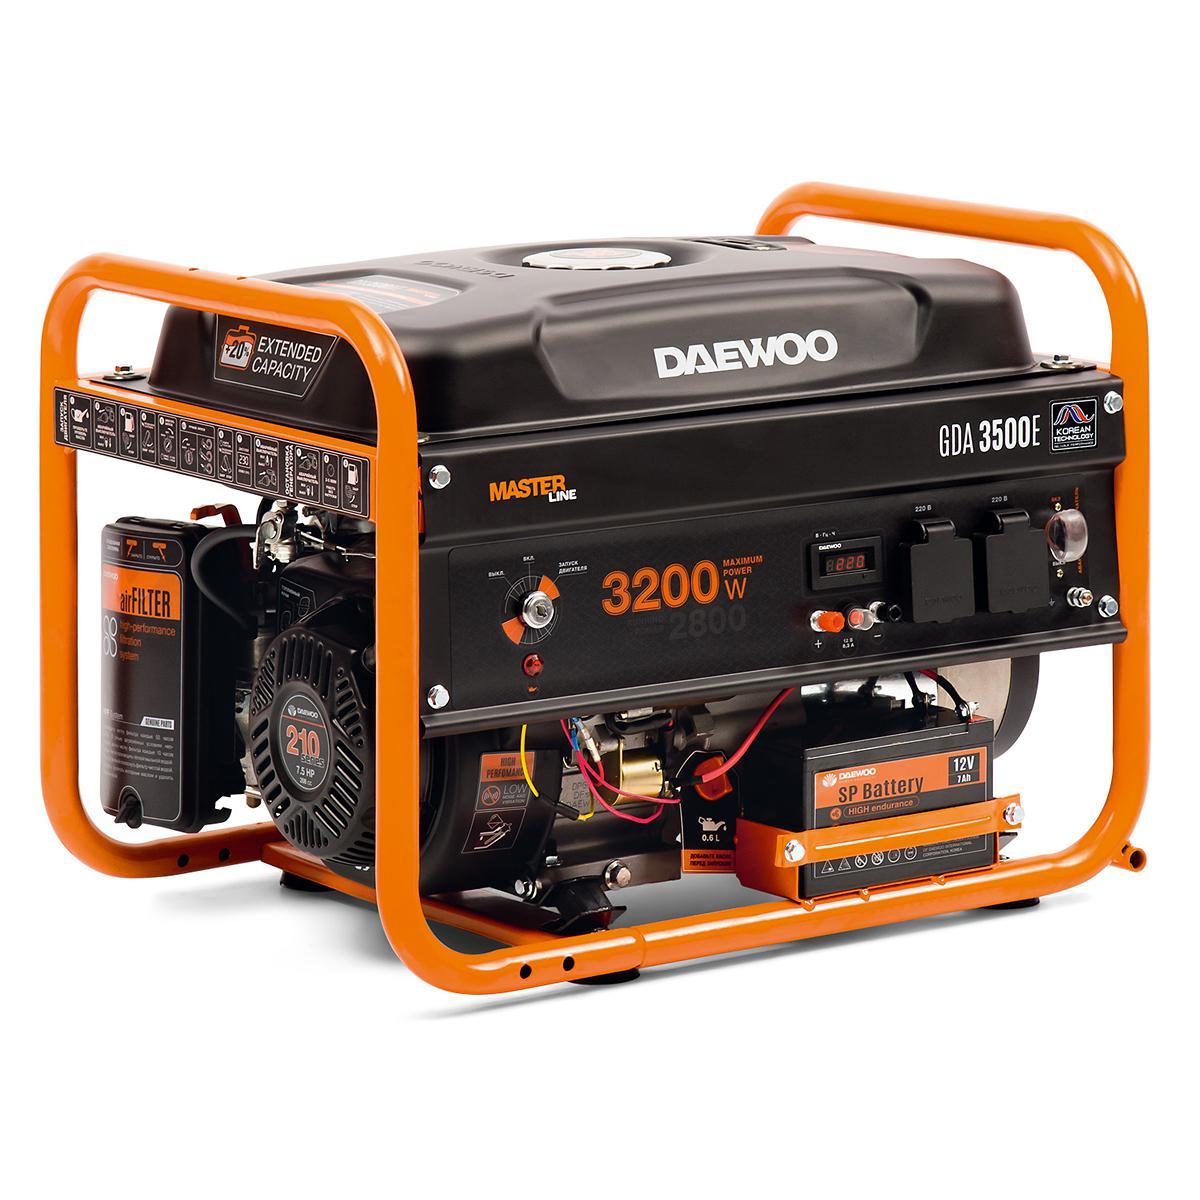 Генератор Daewoo Gda 3500e электрический генератор и электростанция daewoo power products gda 3500 e